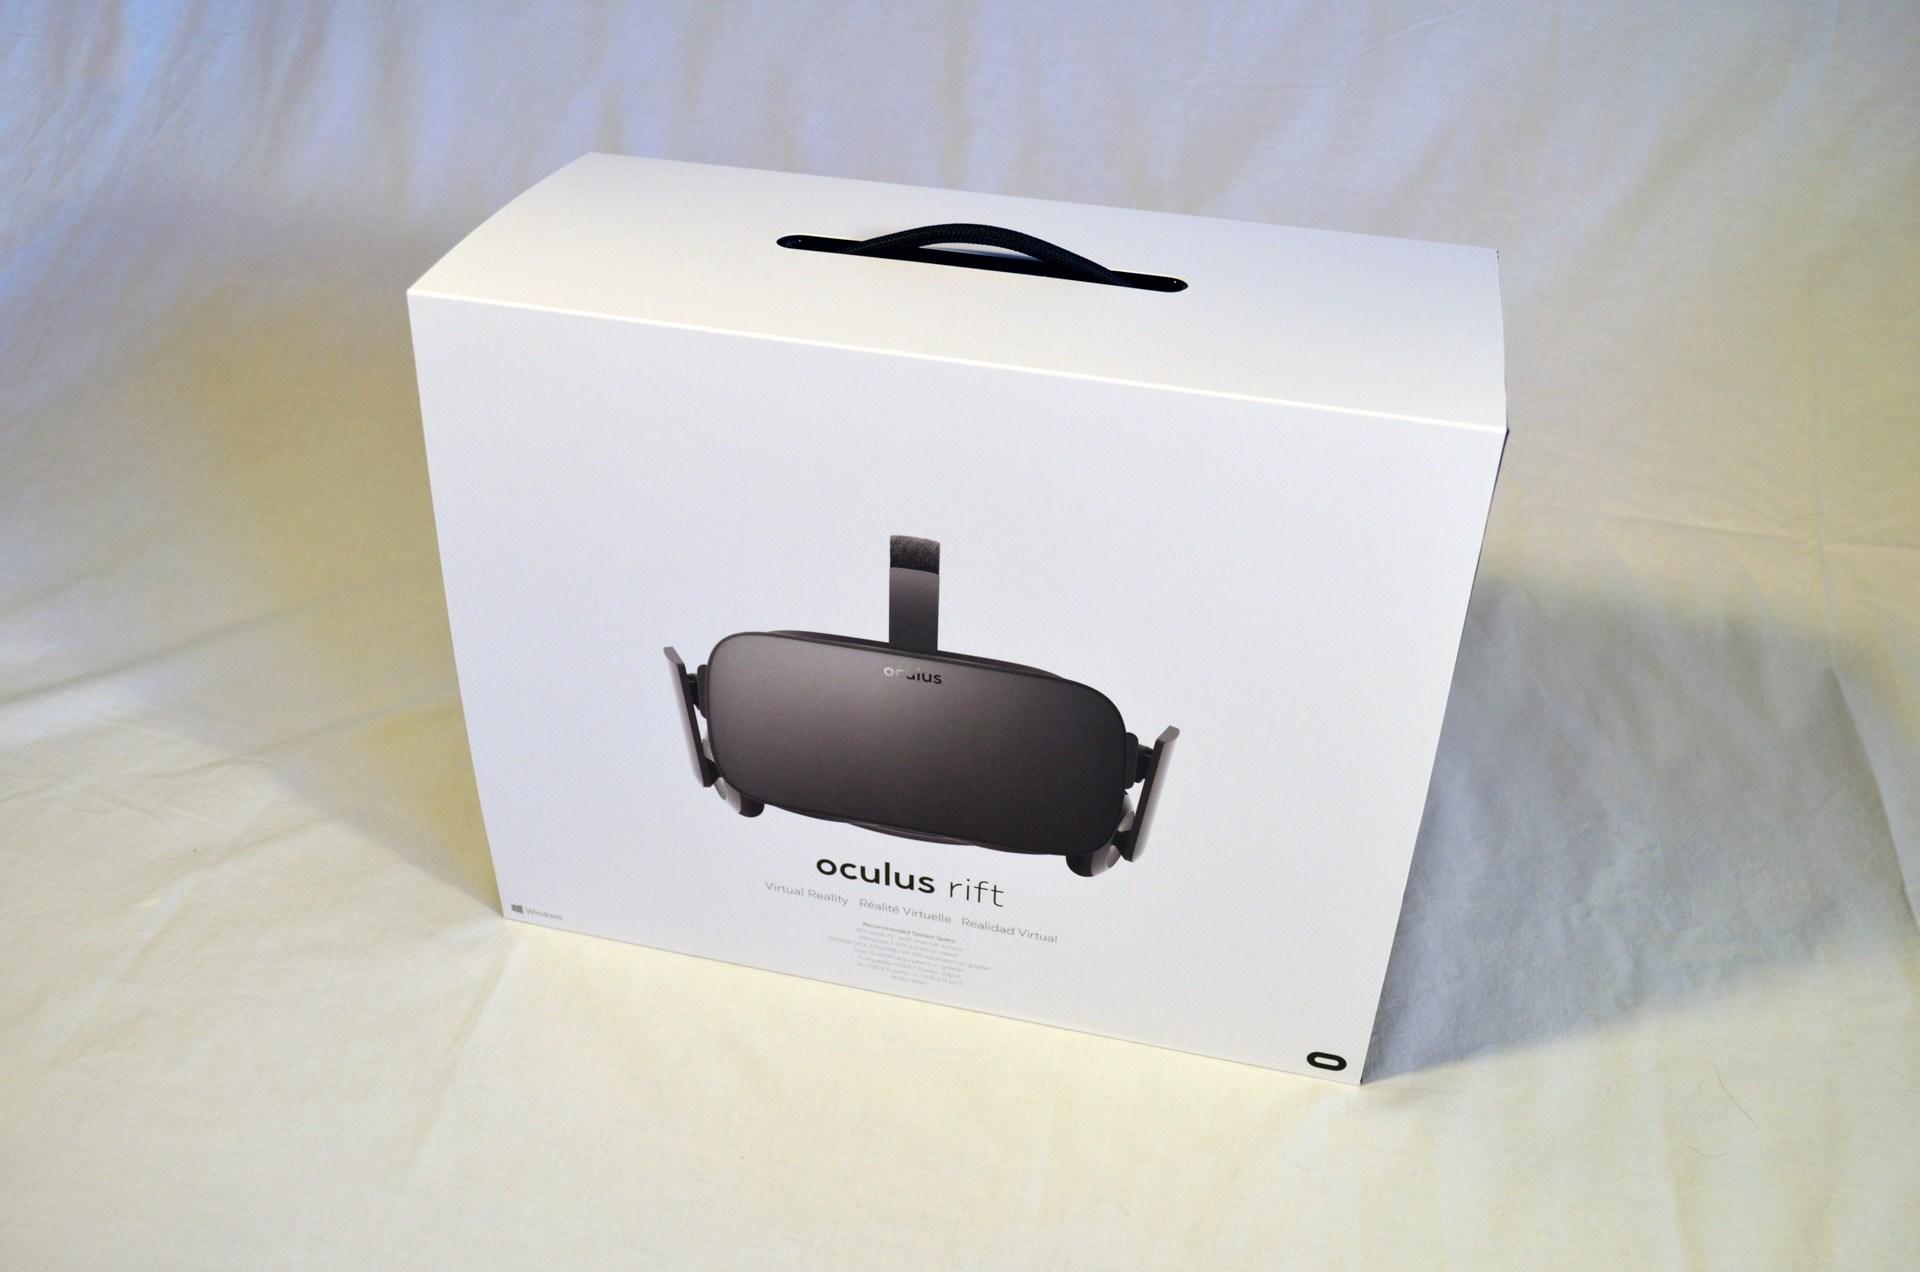 oculus-rift-cv1-unboxing-1.jpg